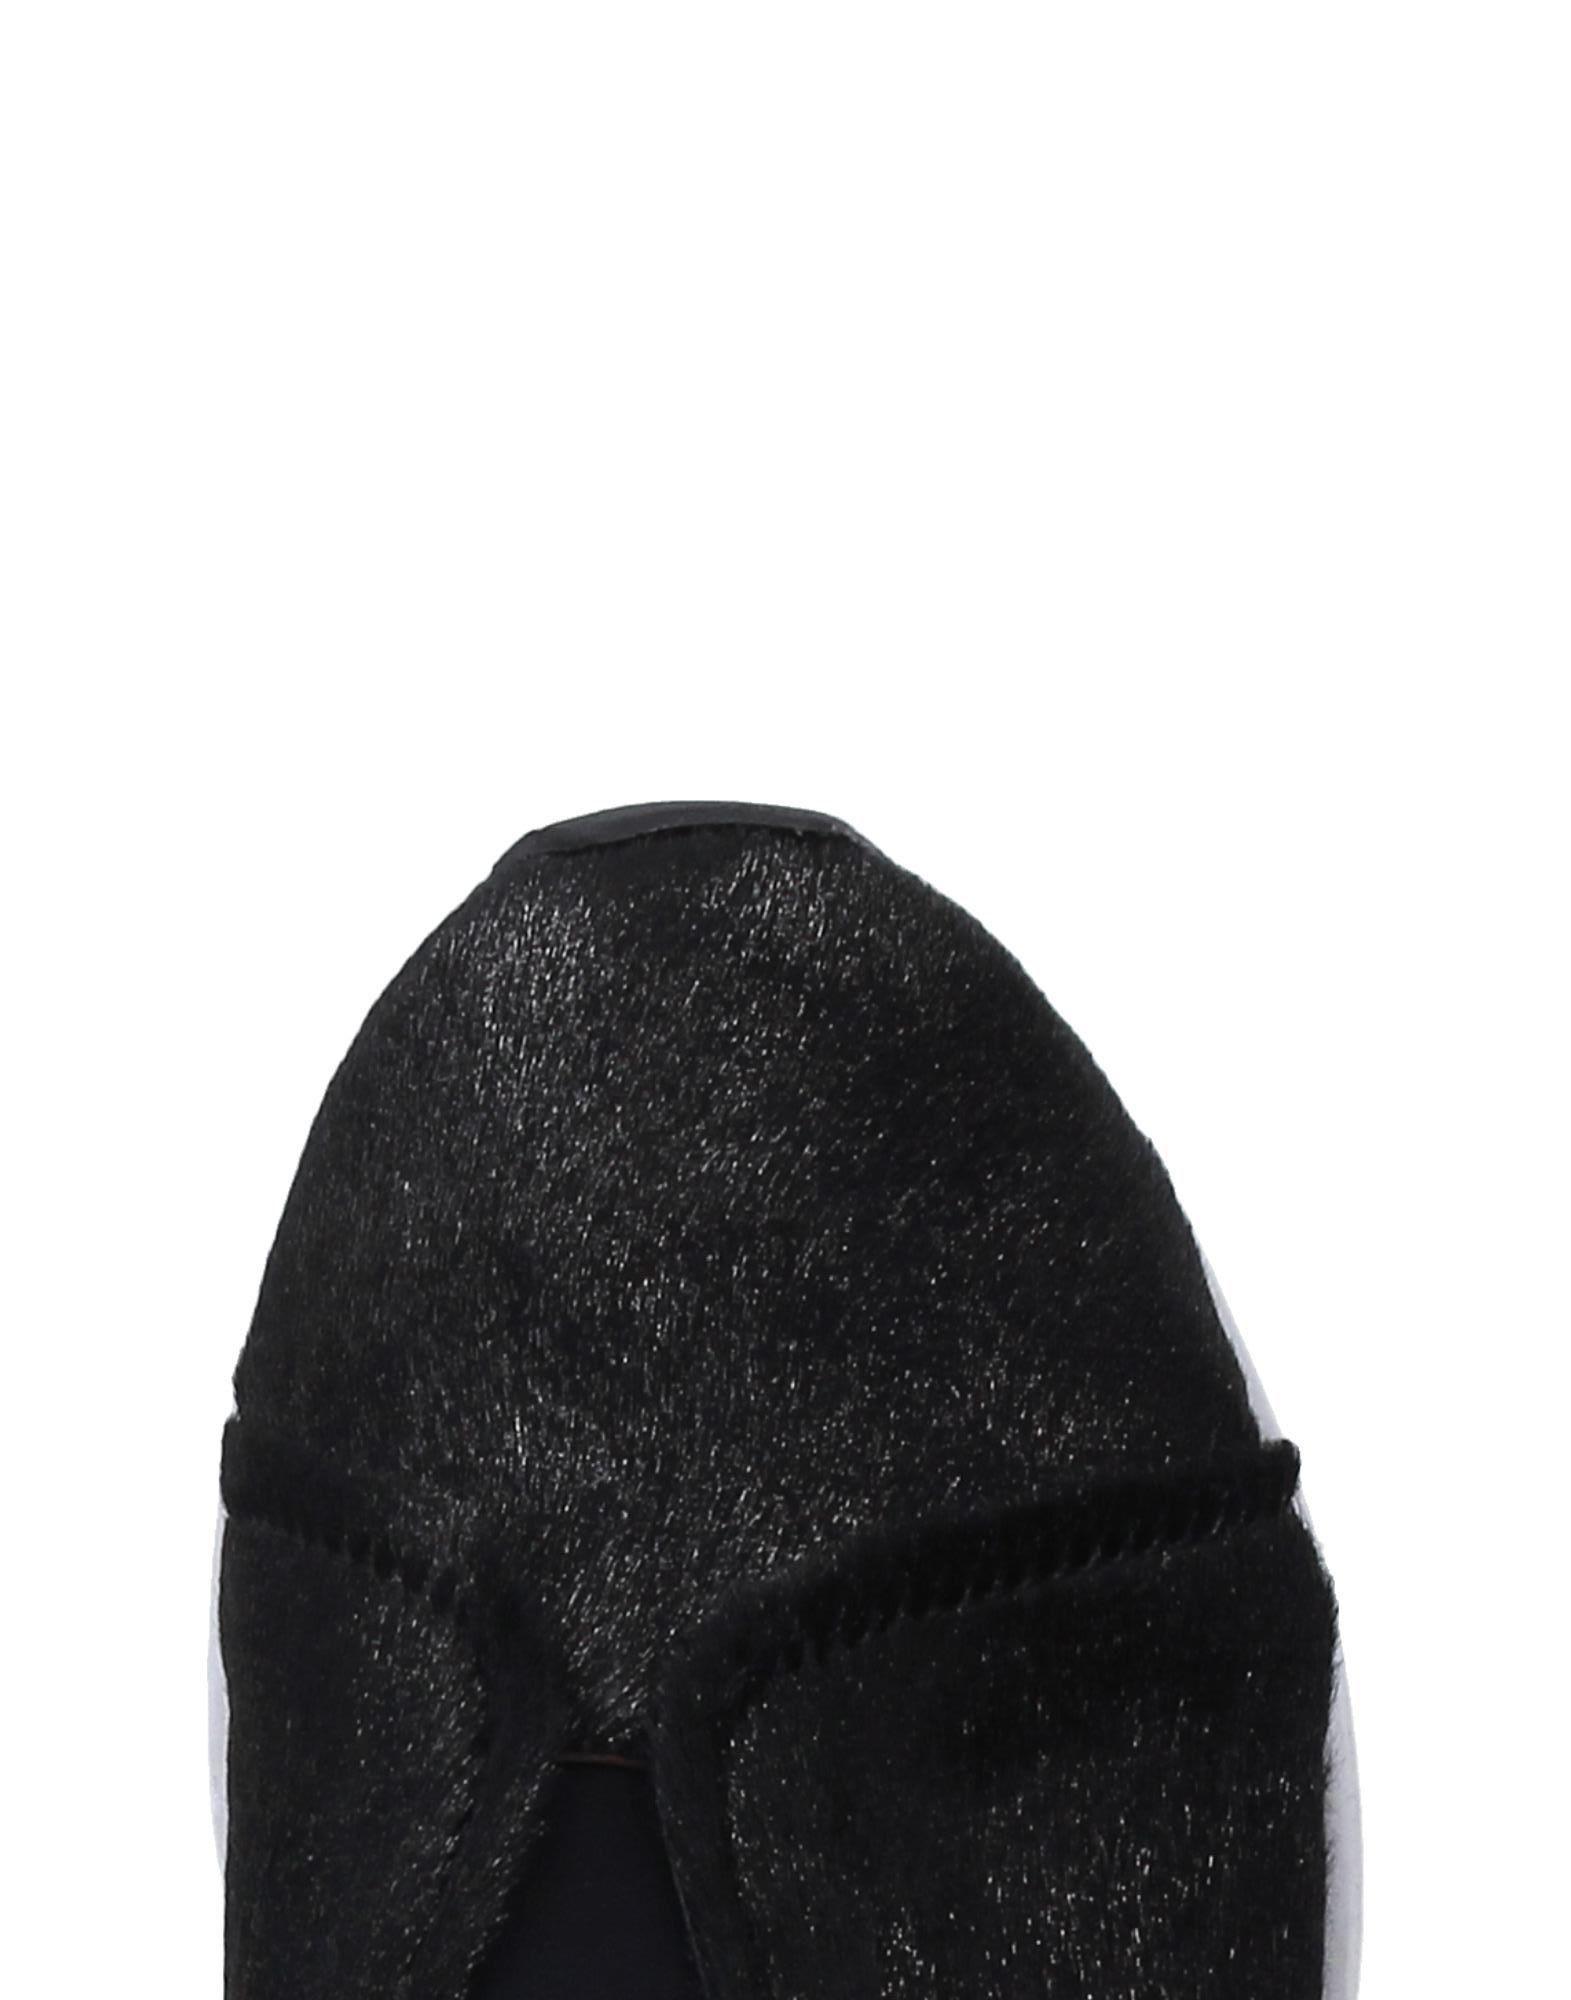 Susana Traça Leather Low-tops & Sneakers in Steel Grey (Grey)